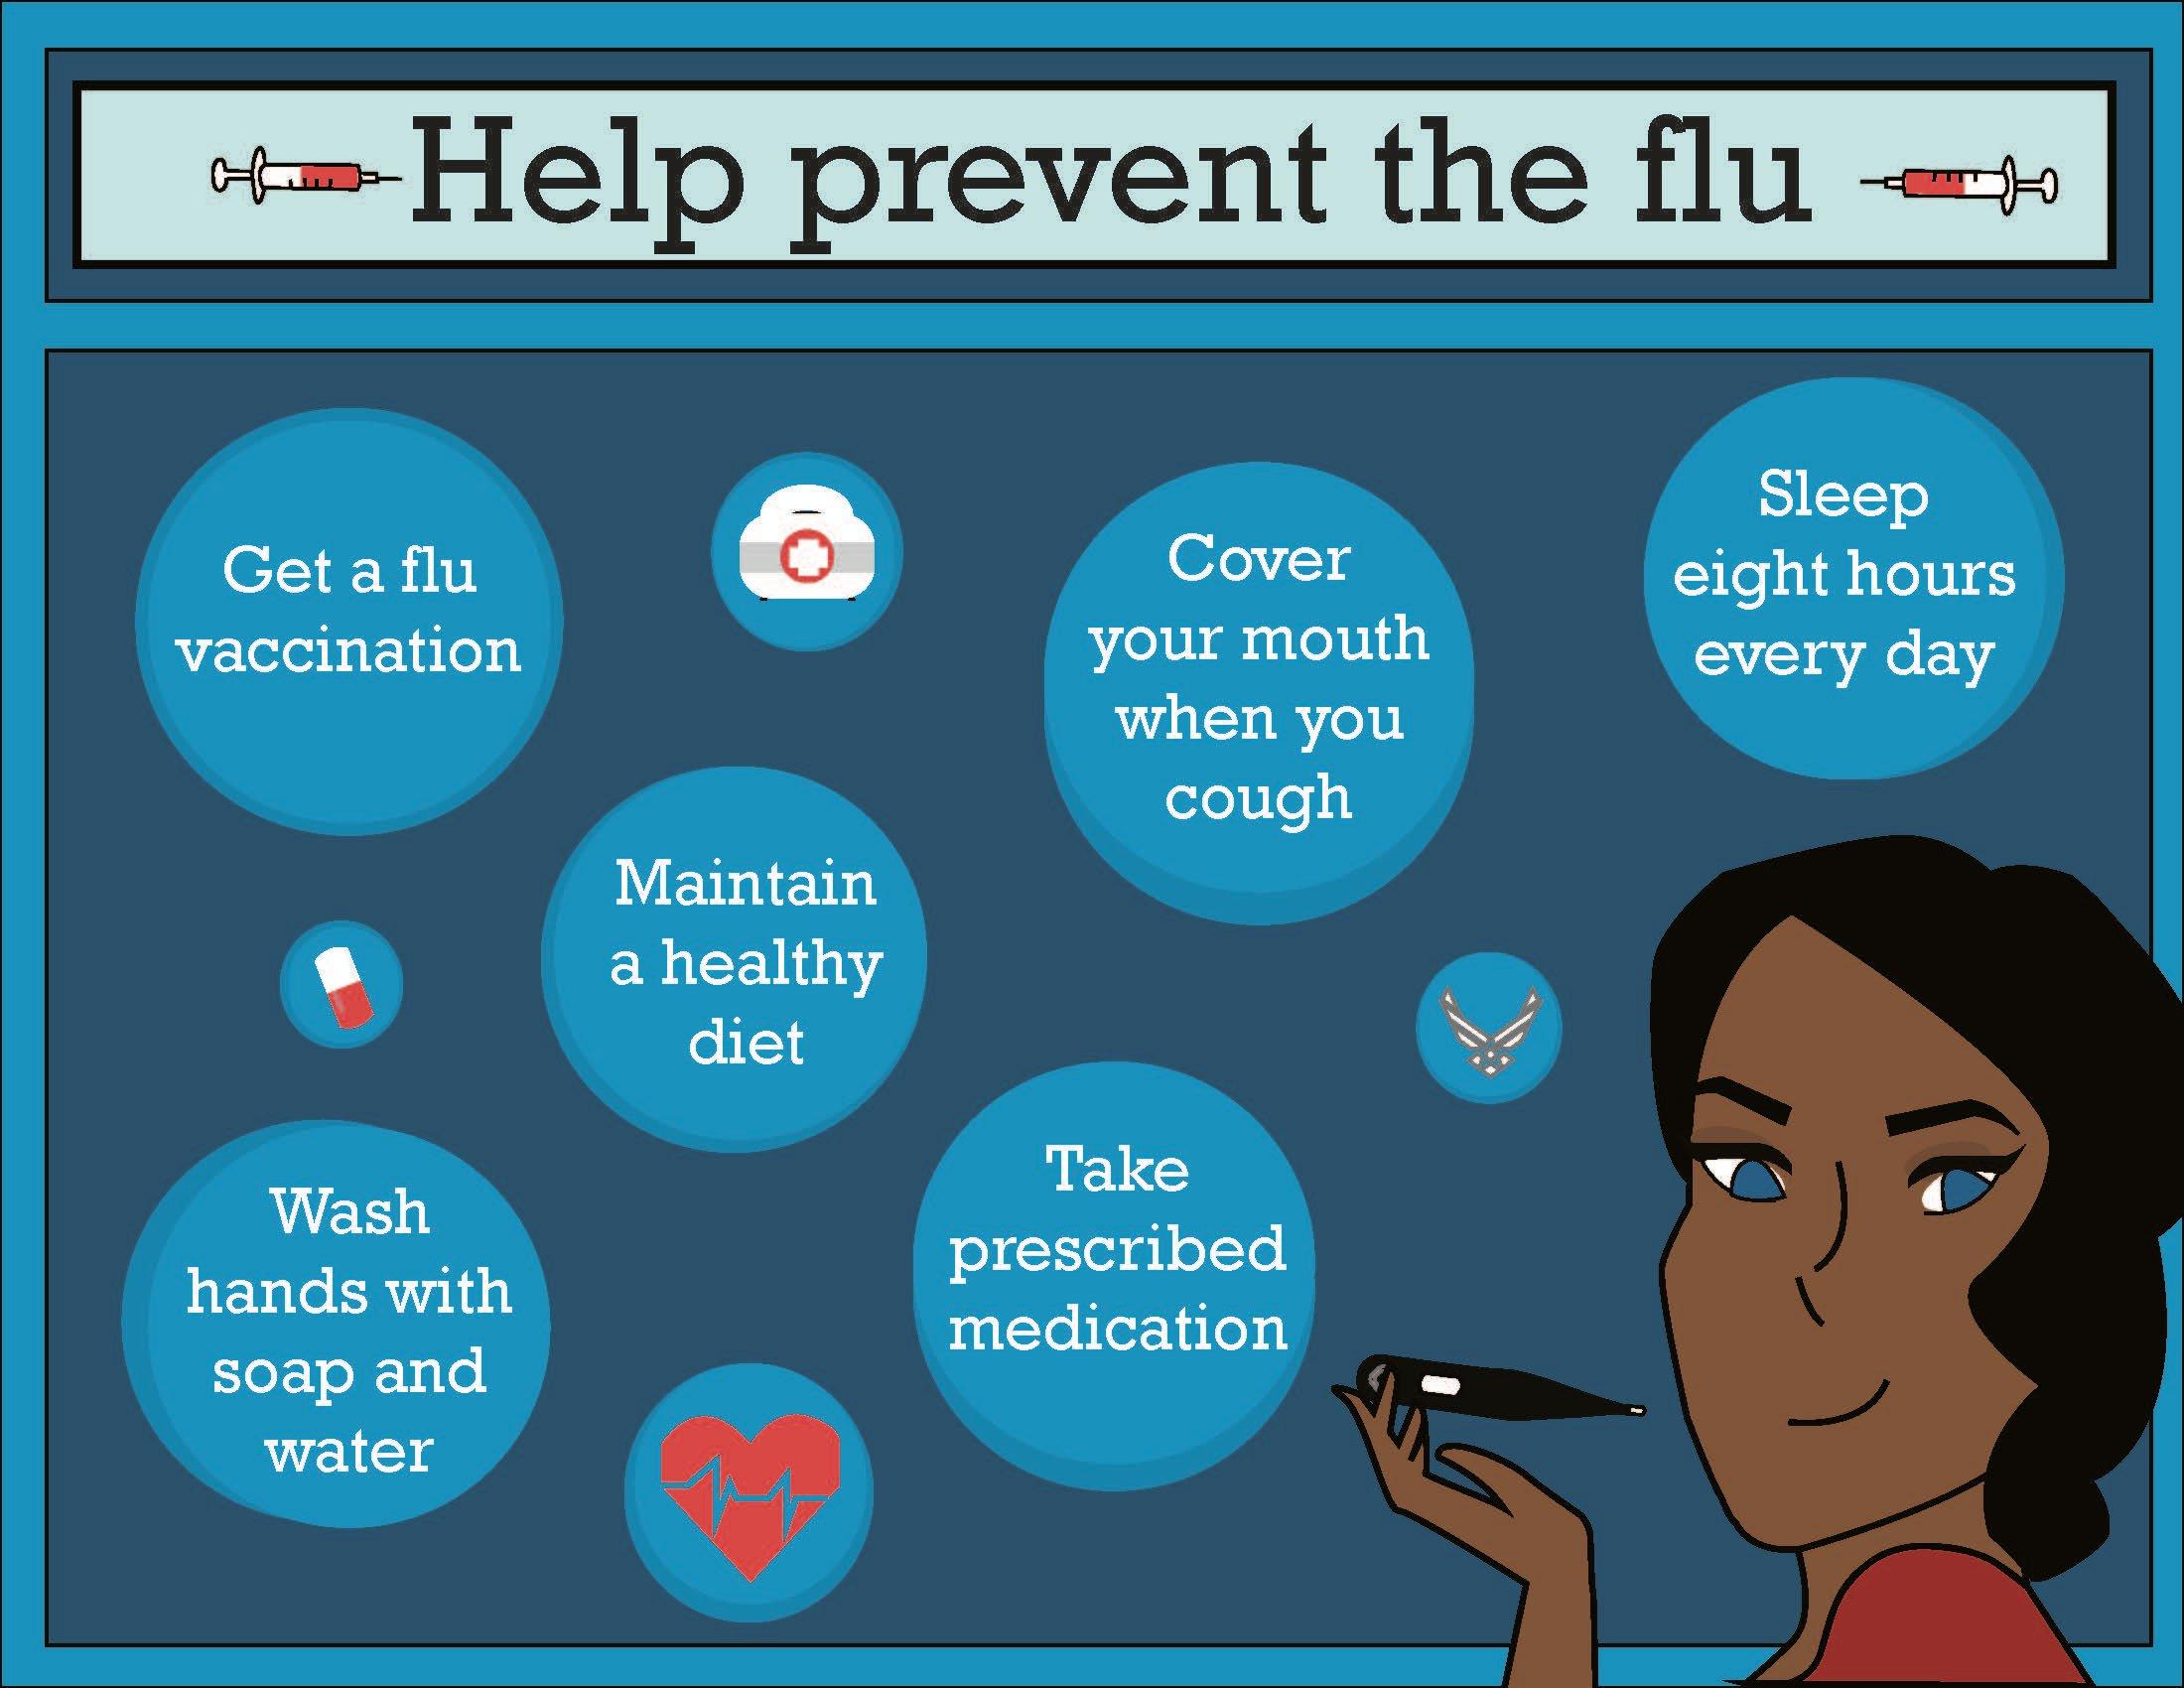 flu prevention infographic